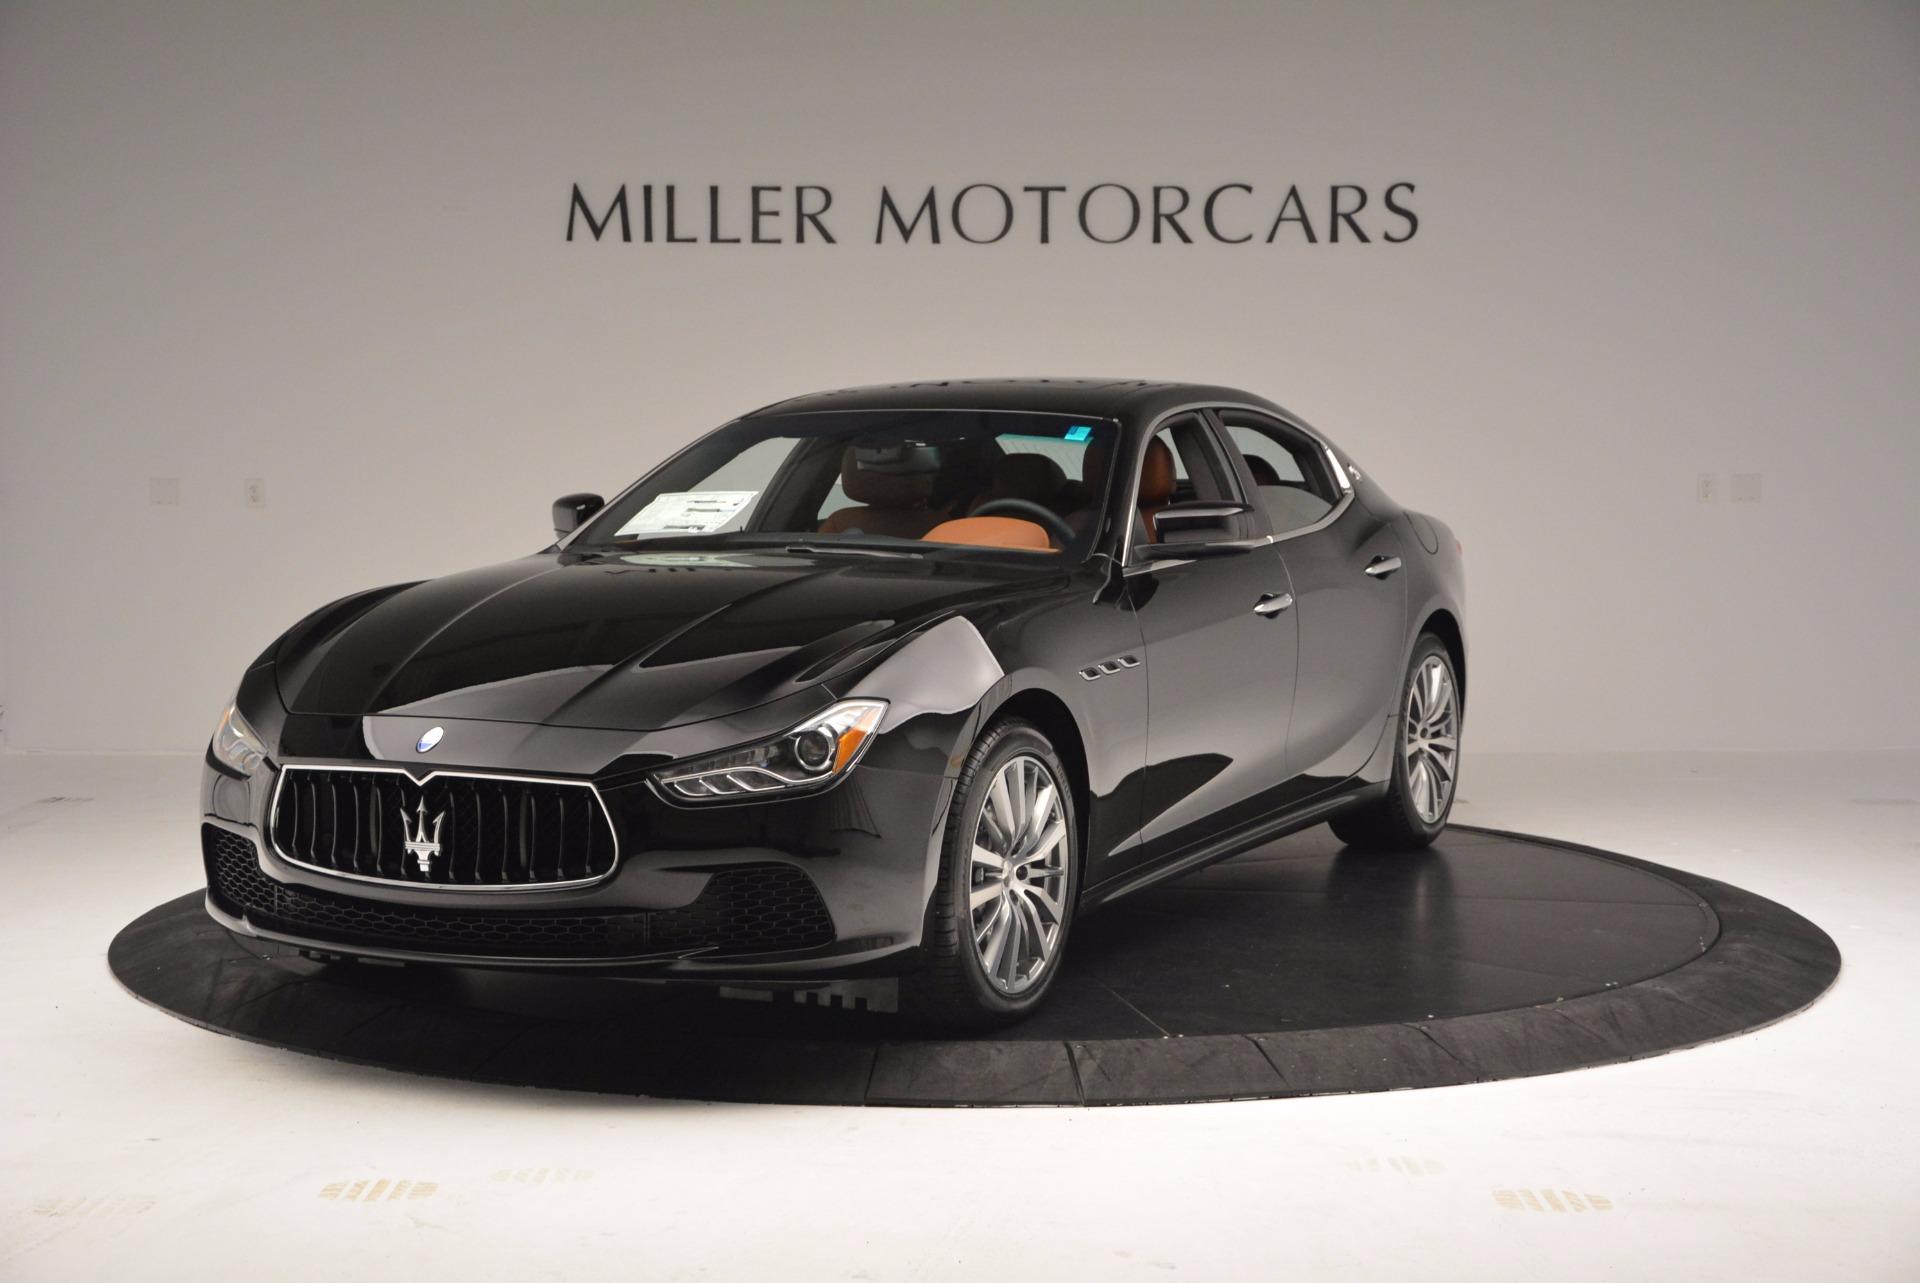 New 2017 Maserati Ghibli S Q4 EX-LOANER For Sale In Greenwich, CT. Alfa Romeo of Greenwich, M1859 1115_main